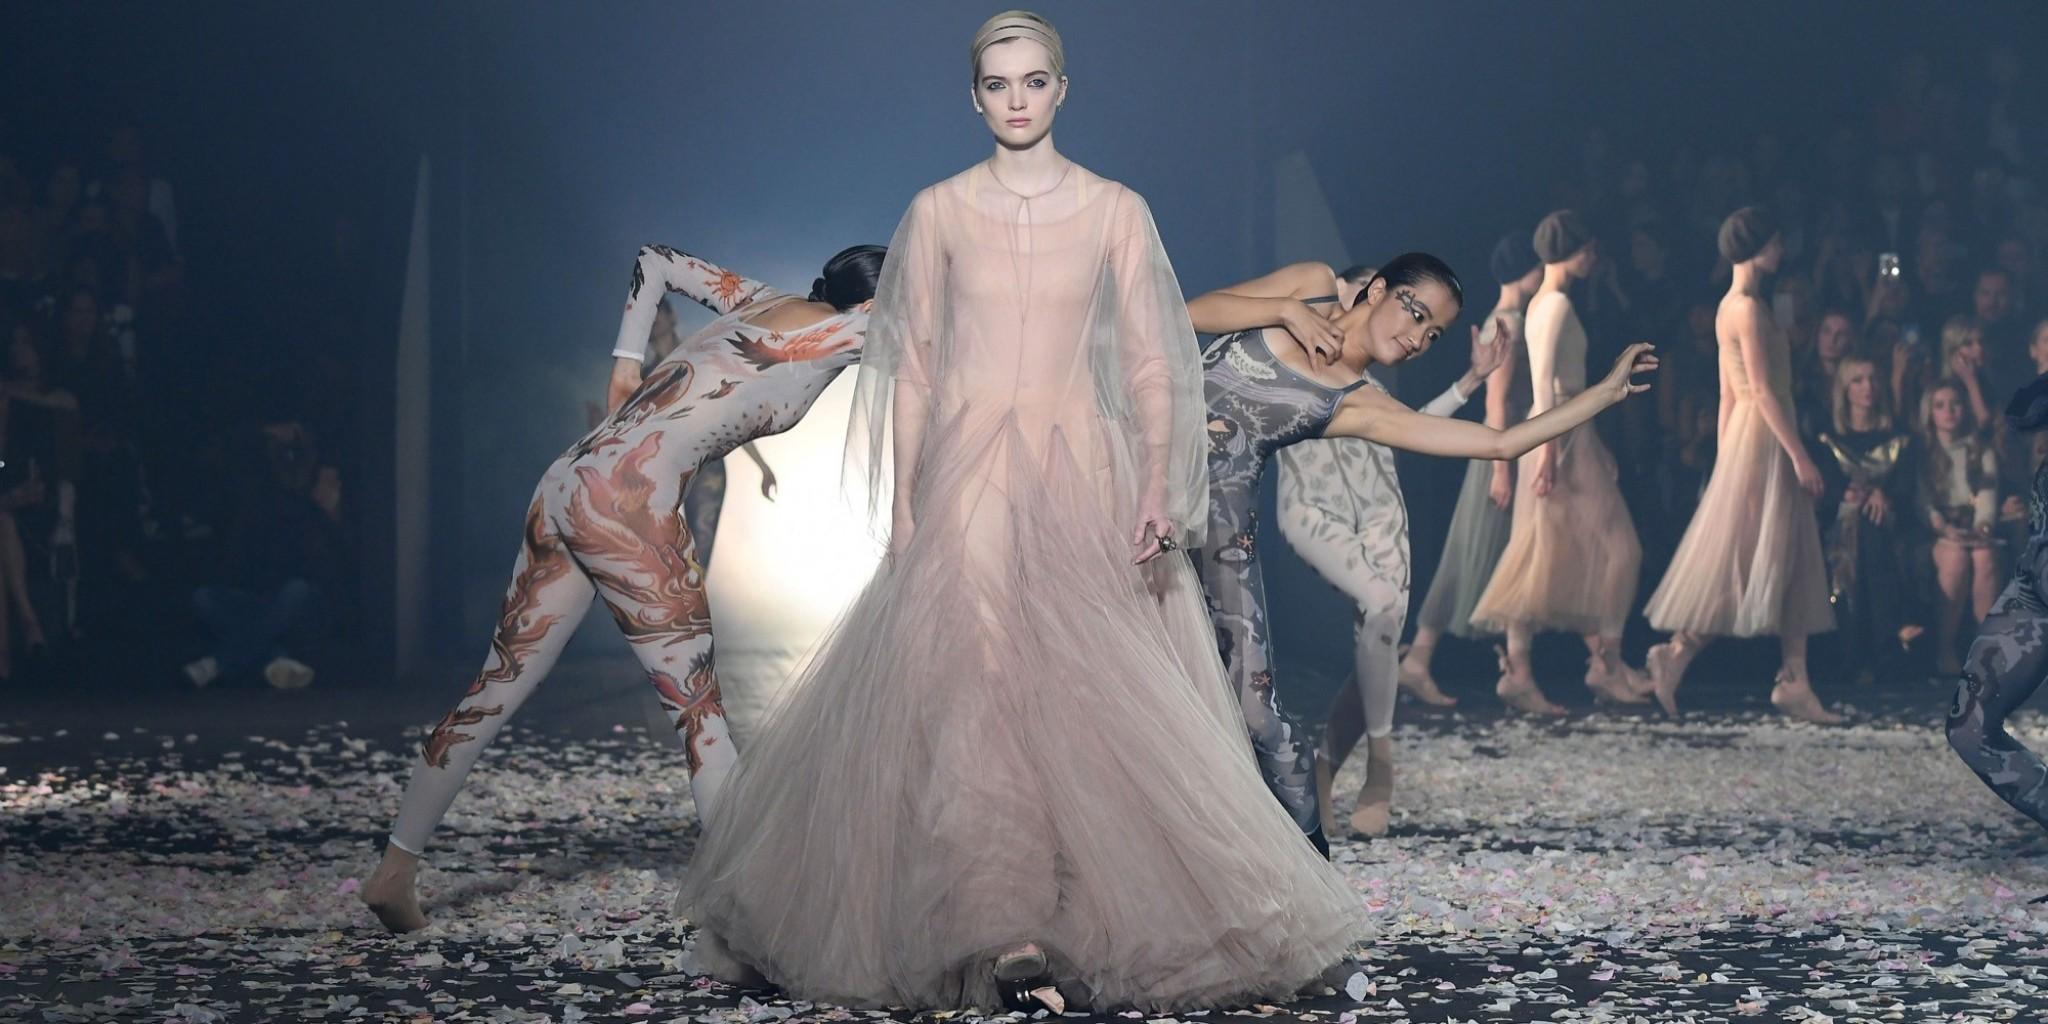 The Spirit of Dance Invades Dior's Spring/Summer 2019 Line-Up